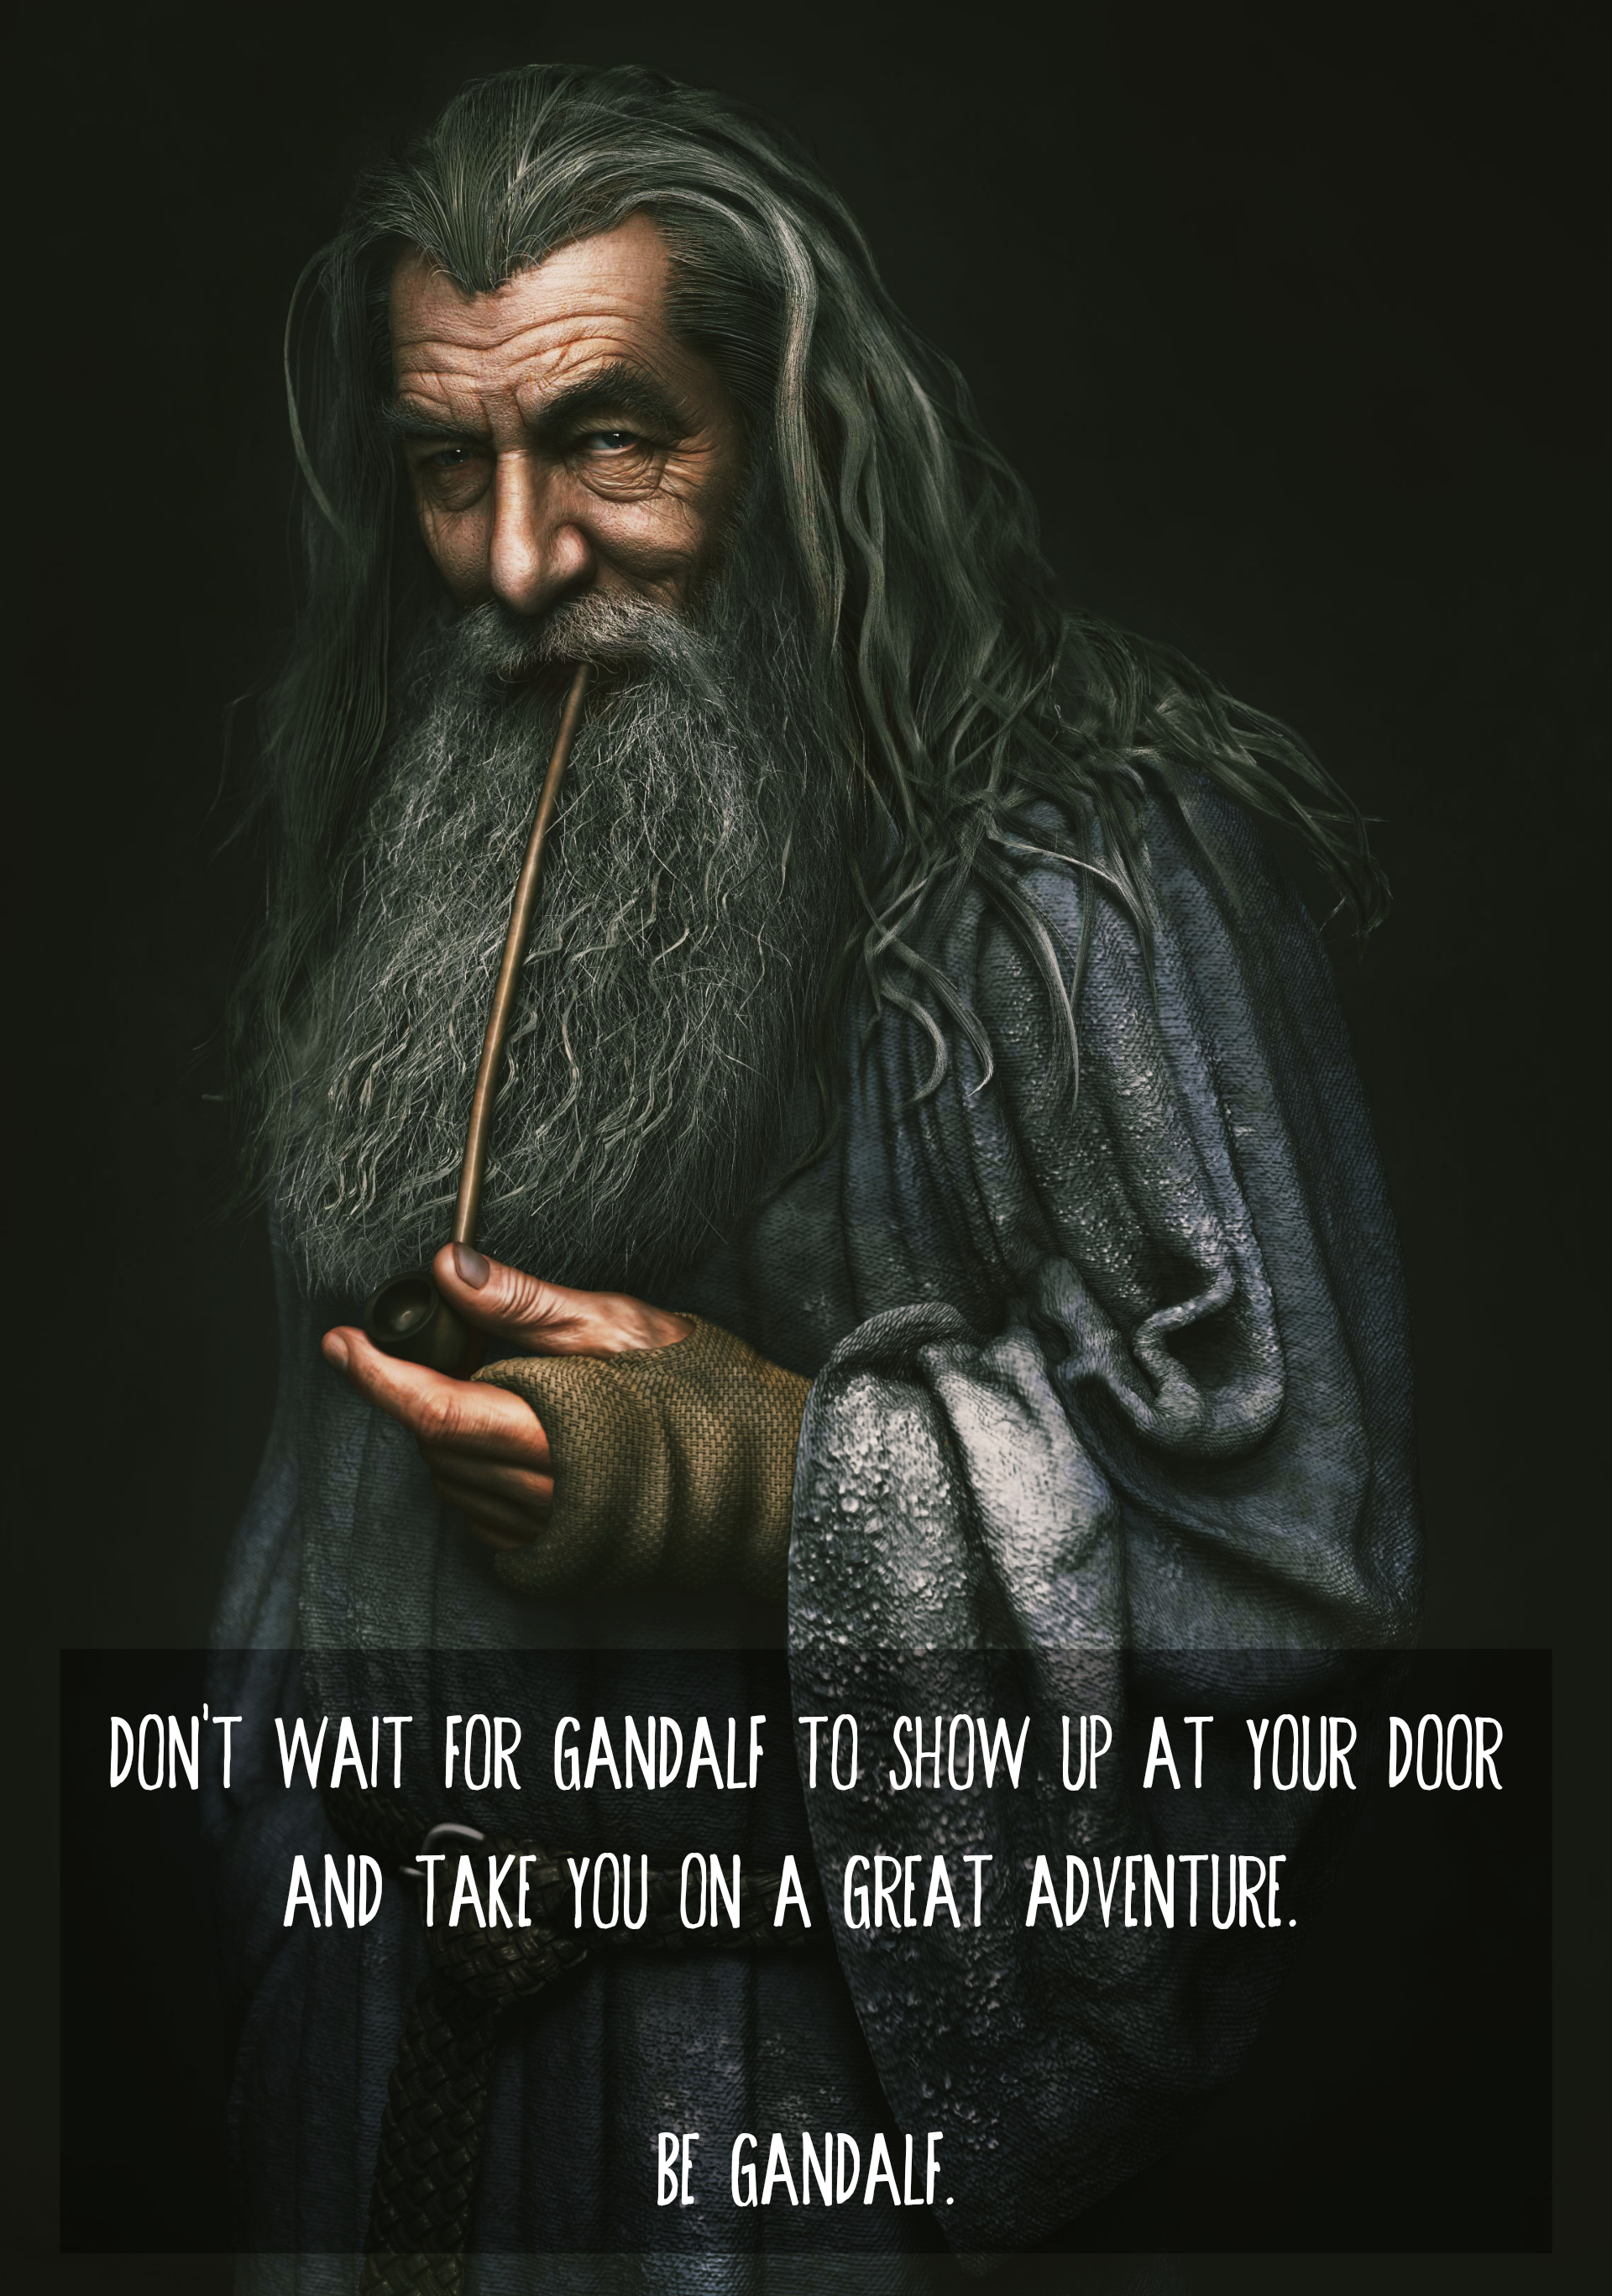 [Image] Be Gandalf.